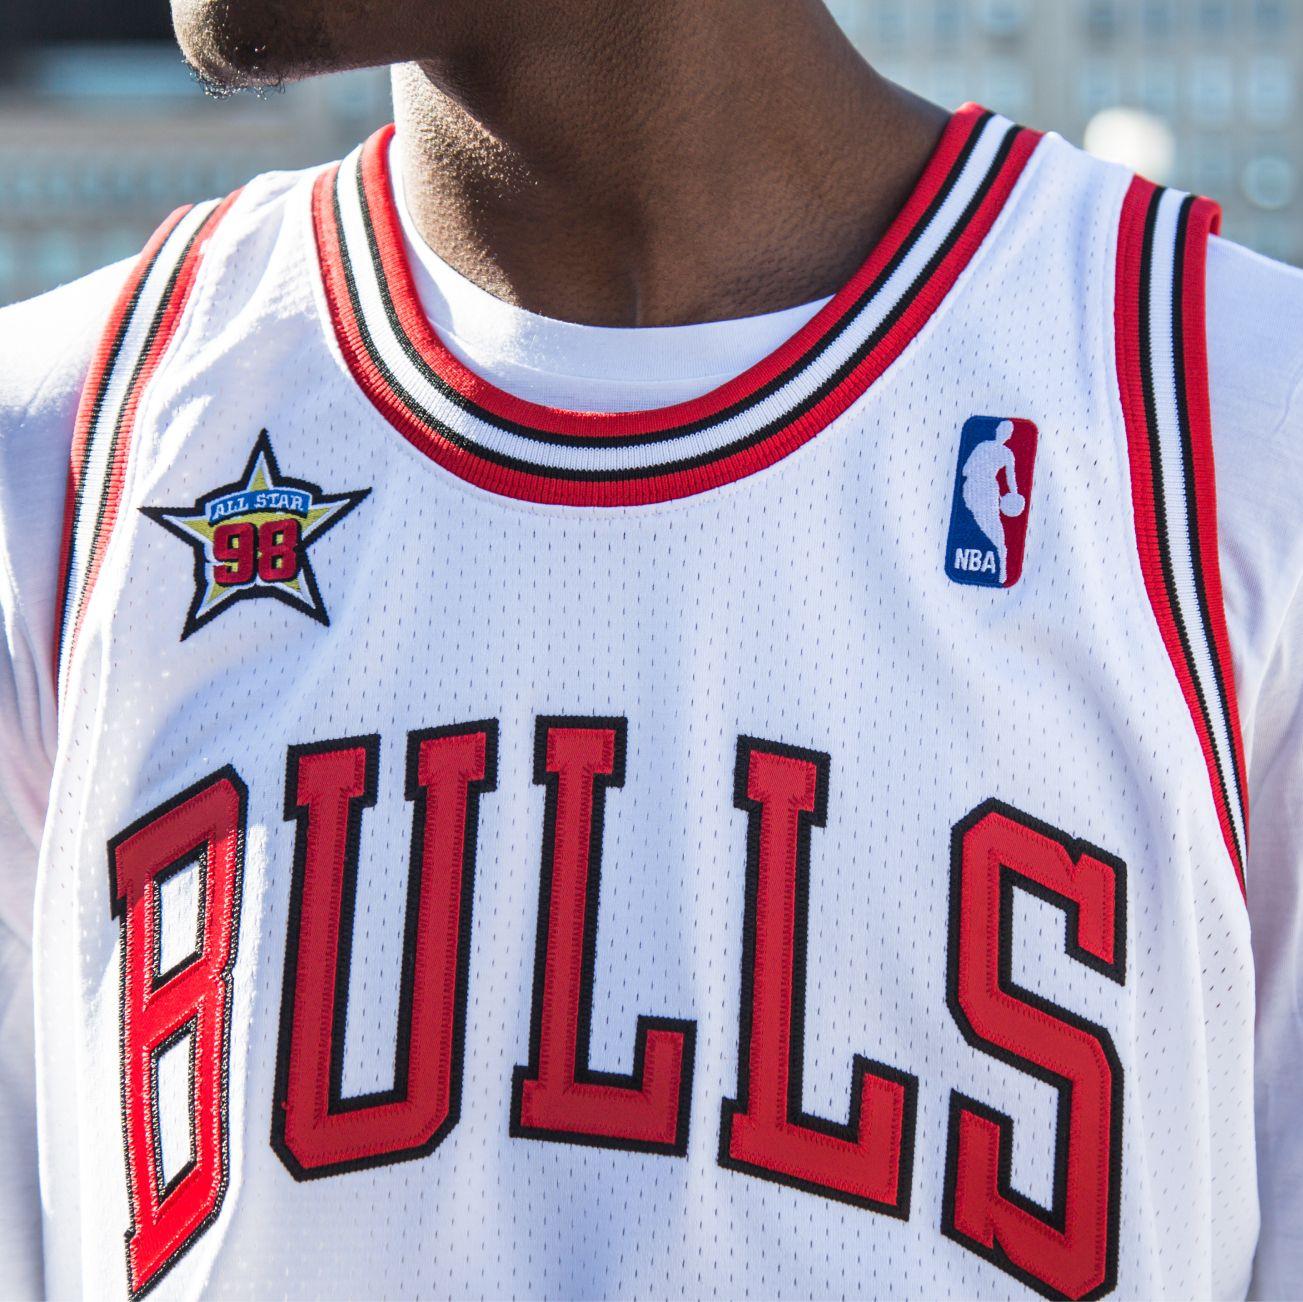 98 All Star Jordan Jersey